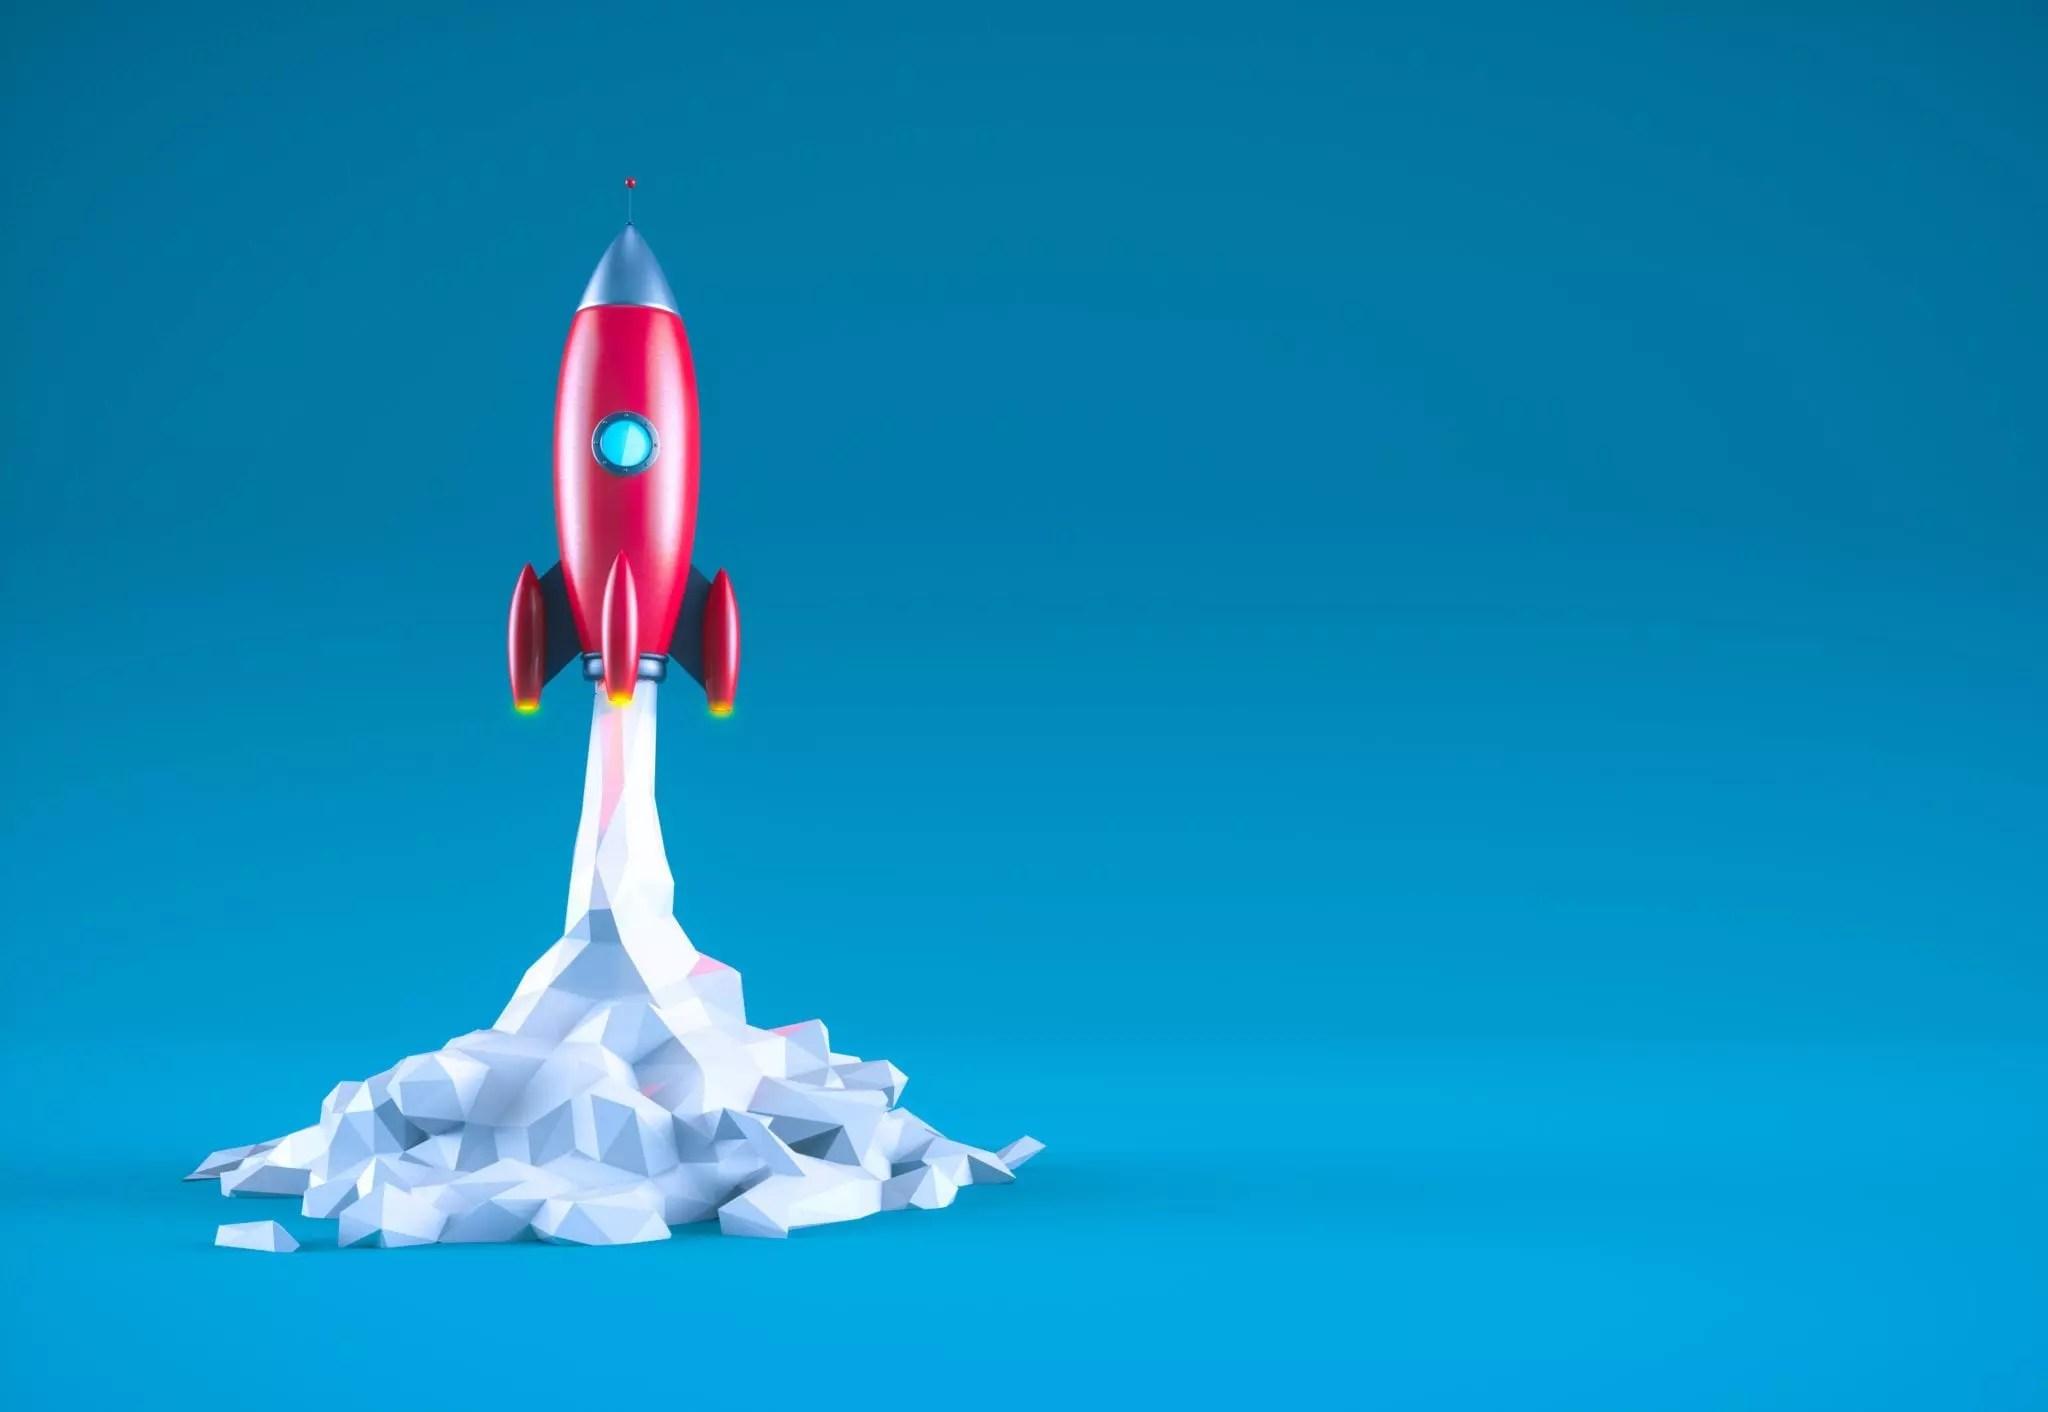 How Can A Digital Skyrocket Help You?